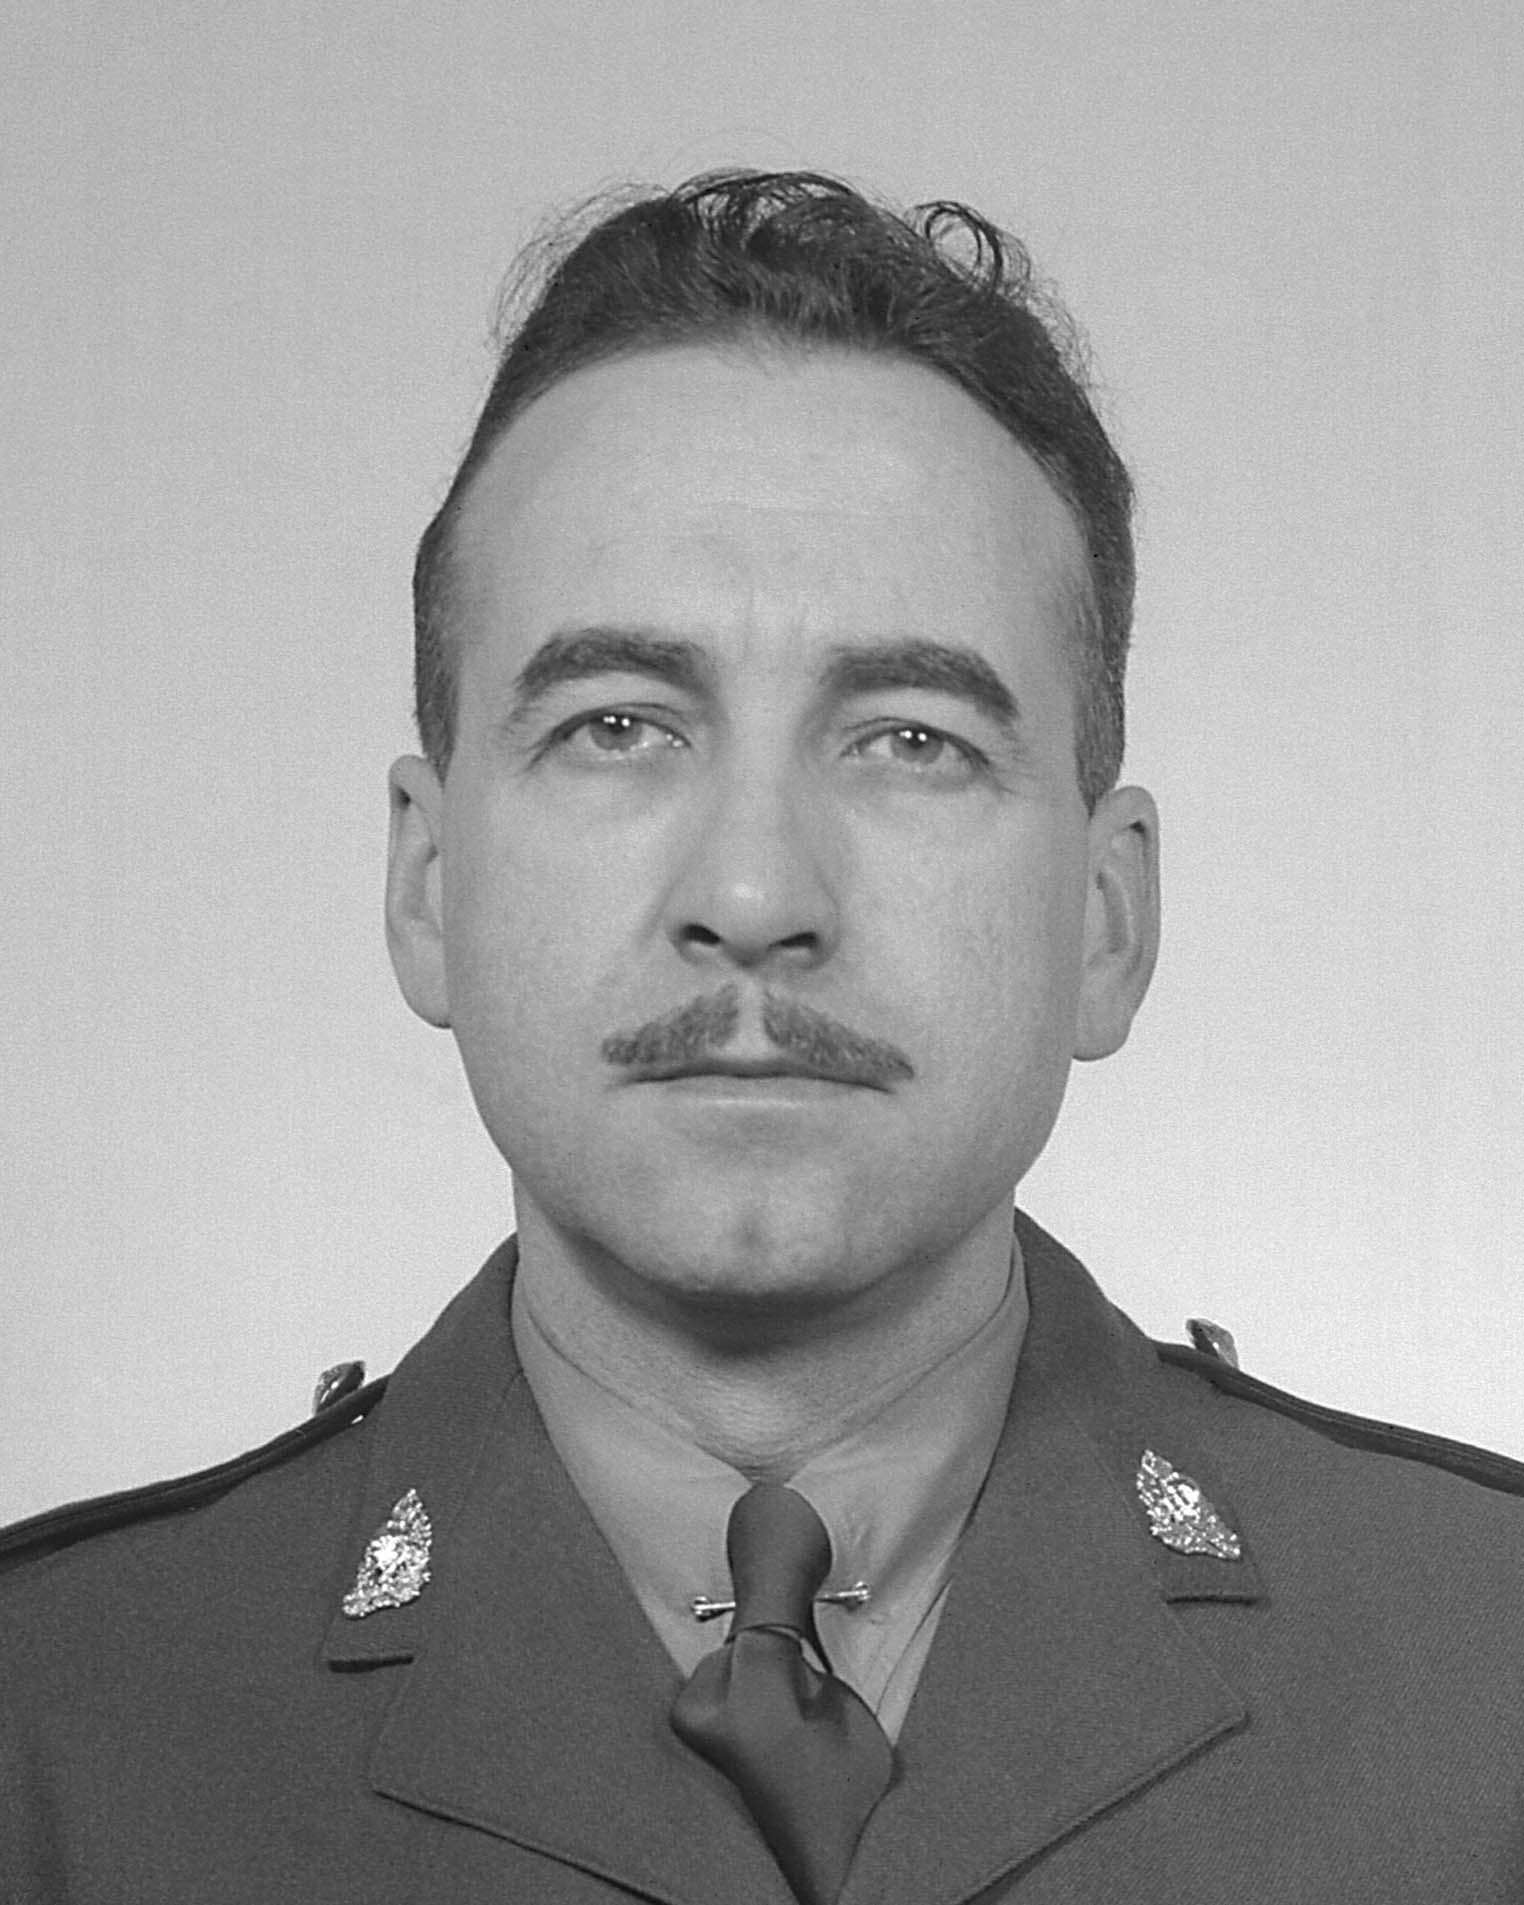 Inspecteur David James McCombe